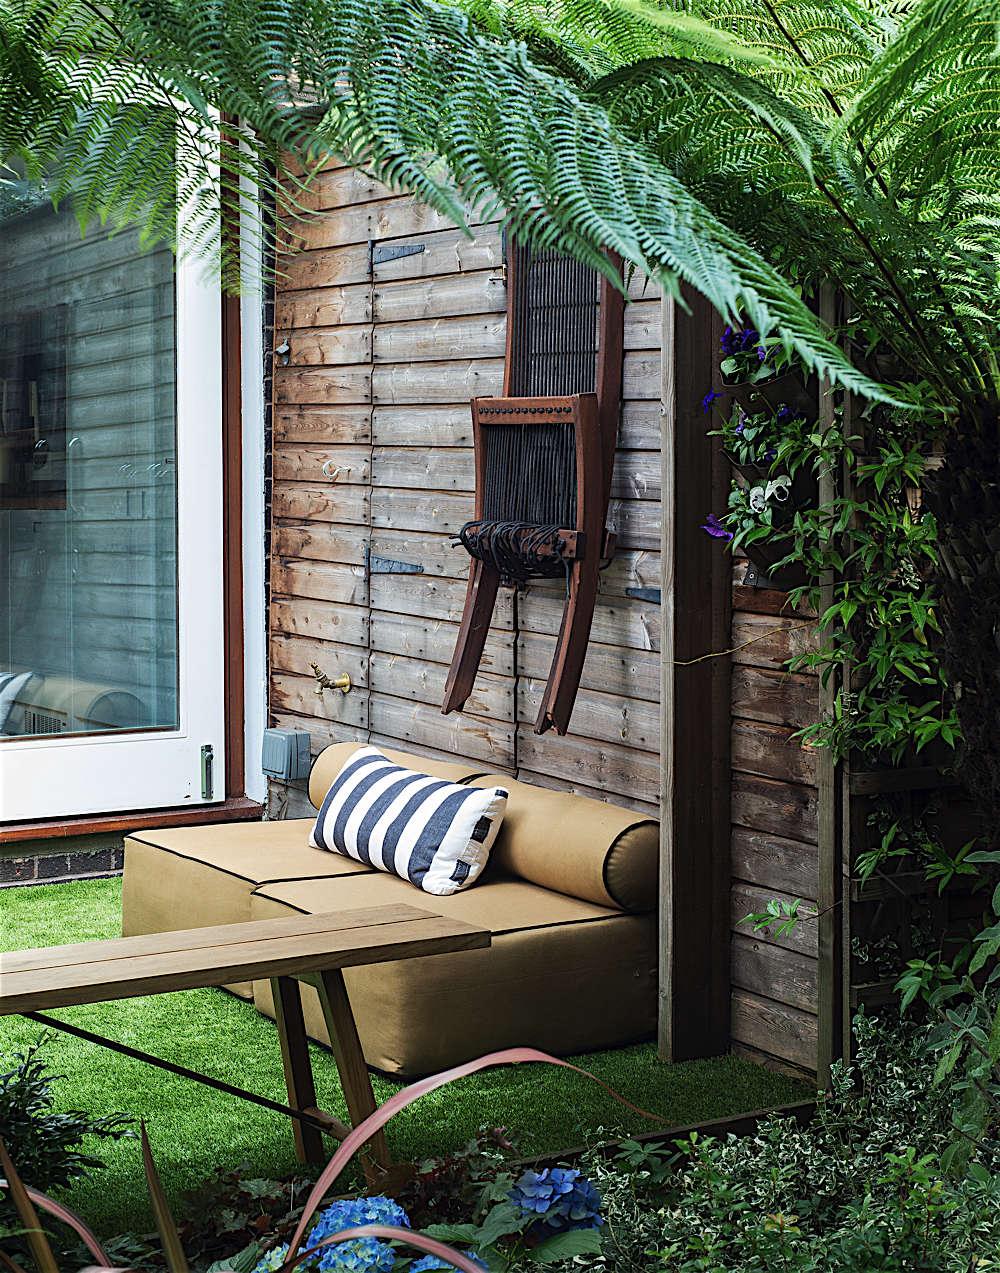 Christine Chang Hanway, London garden, Garden as exterior room, artificial grass, outdoor seating, garden shed, large tree fern, Matthew Williams | Gardenista